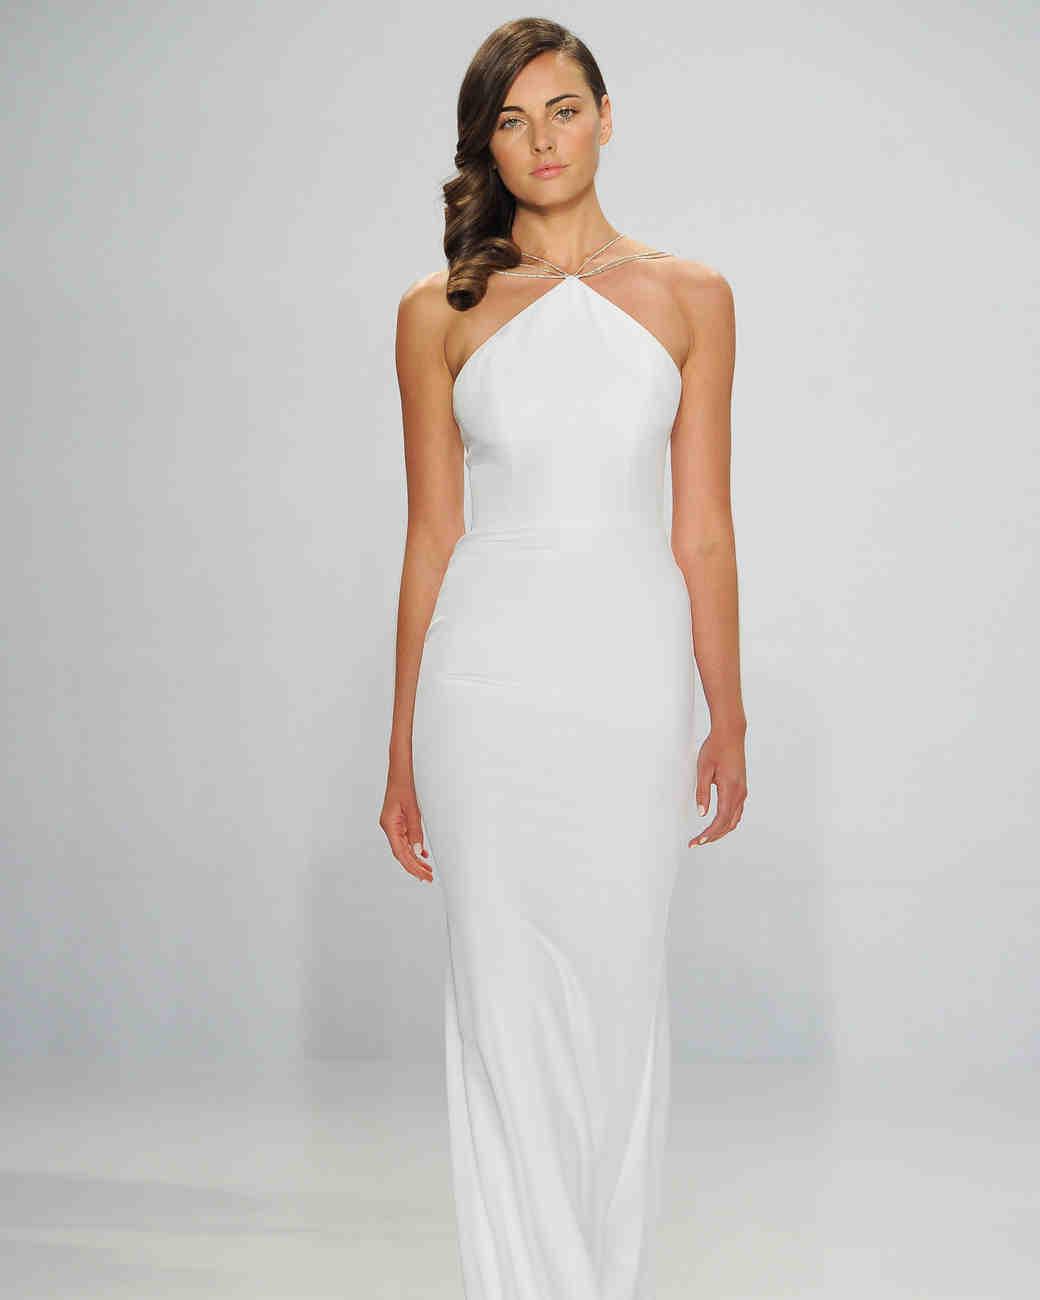 Christian Siriano Halter-Neck Wedding Dress